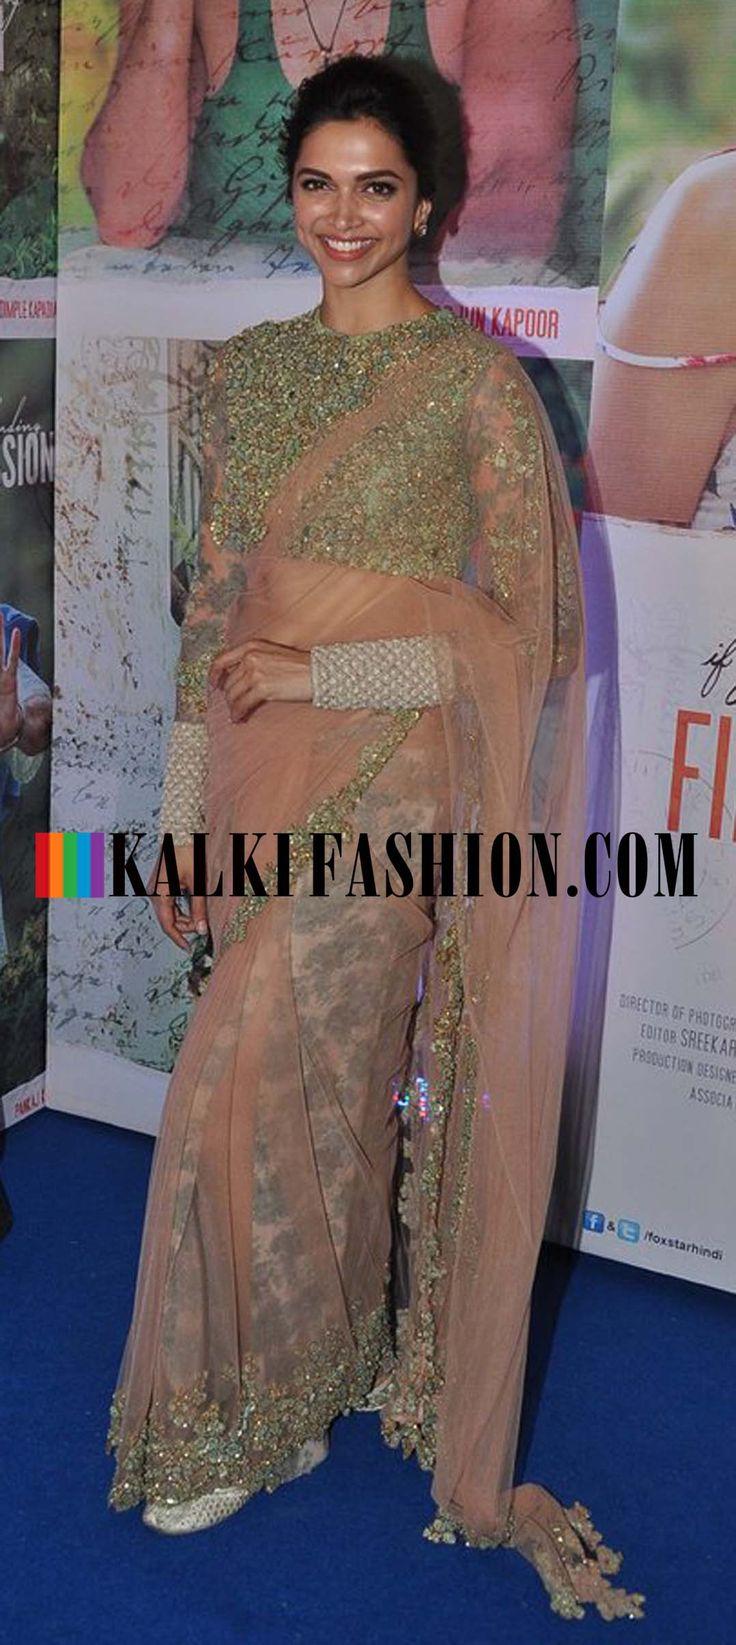 Deepika Padukone looks in gorgeous Sabyasachi saree attending Finding Fanny success bash. http://www.kalkifashion.com/